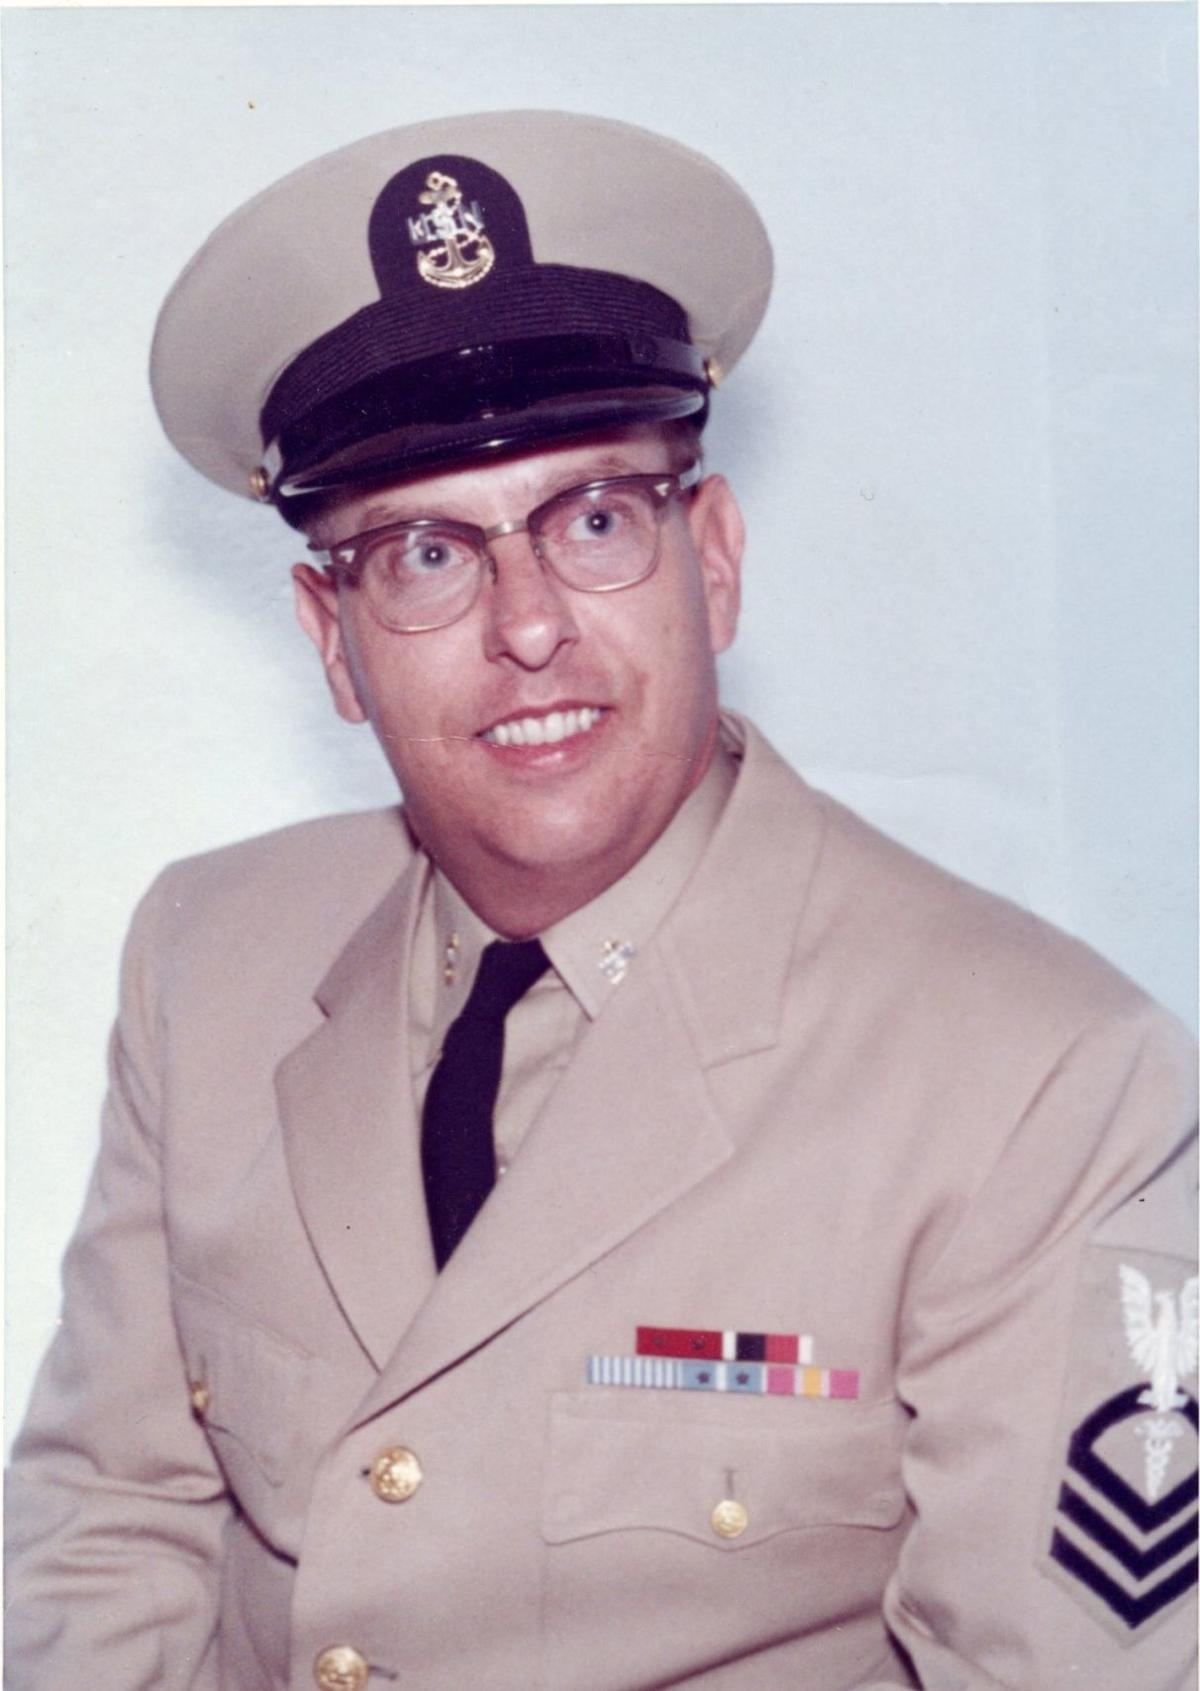 James Joseph Hillar